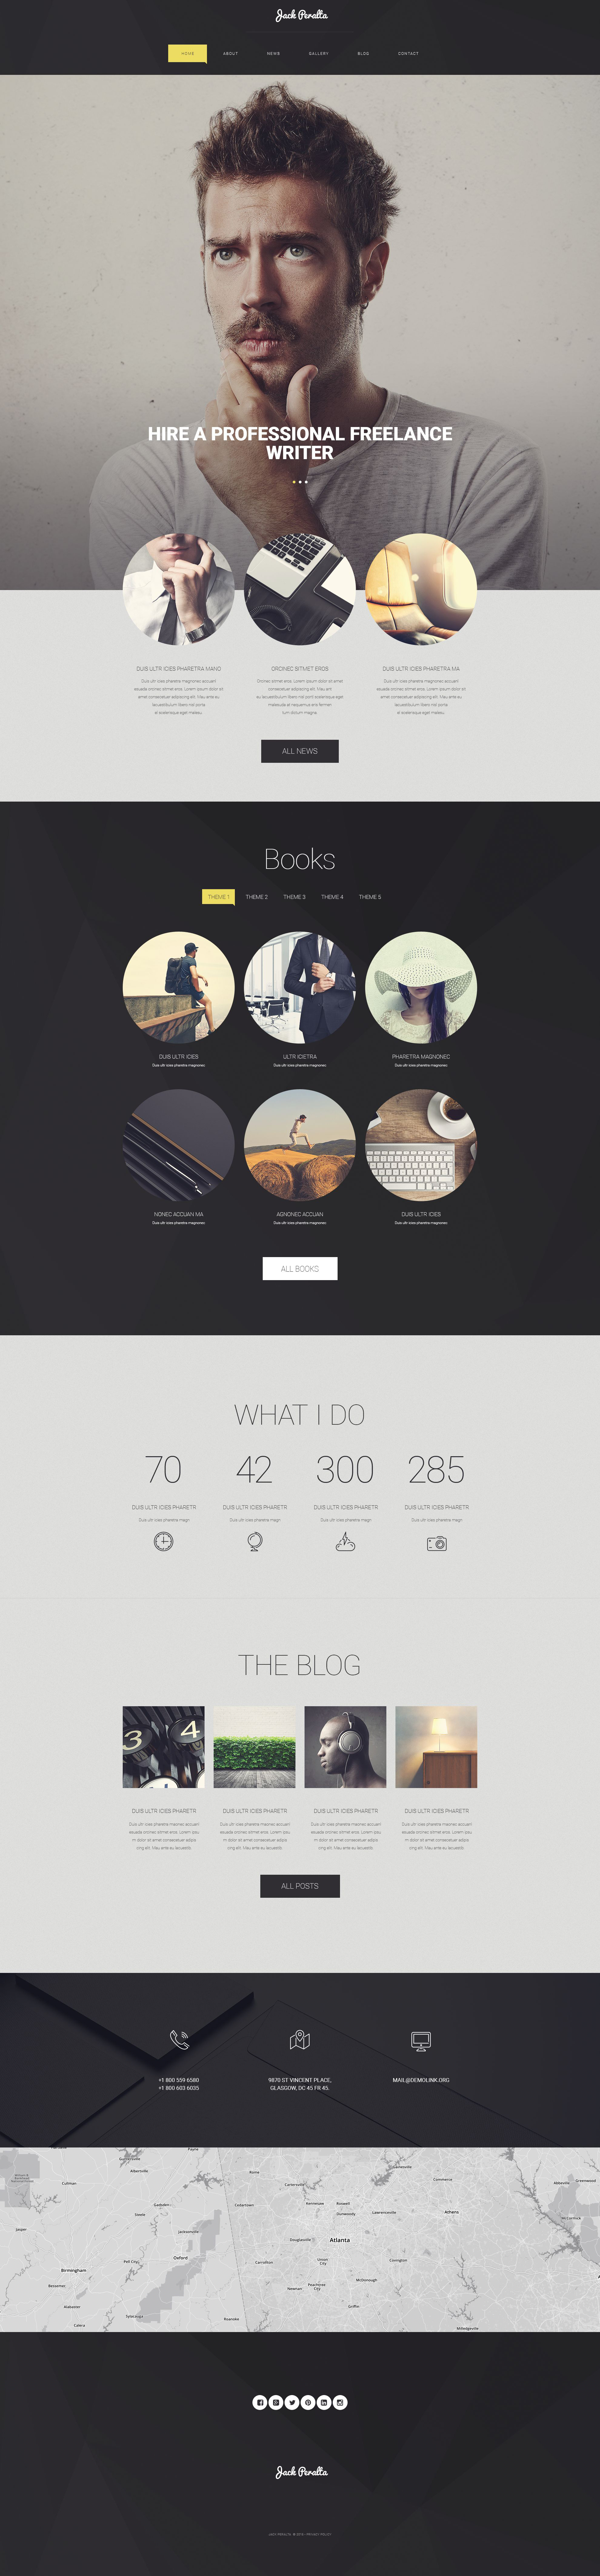 "Tema De WordPress ""Freelance Writer"" #54585 - captura de pantalla"